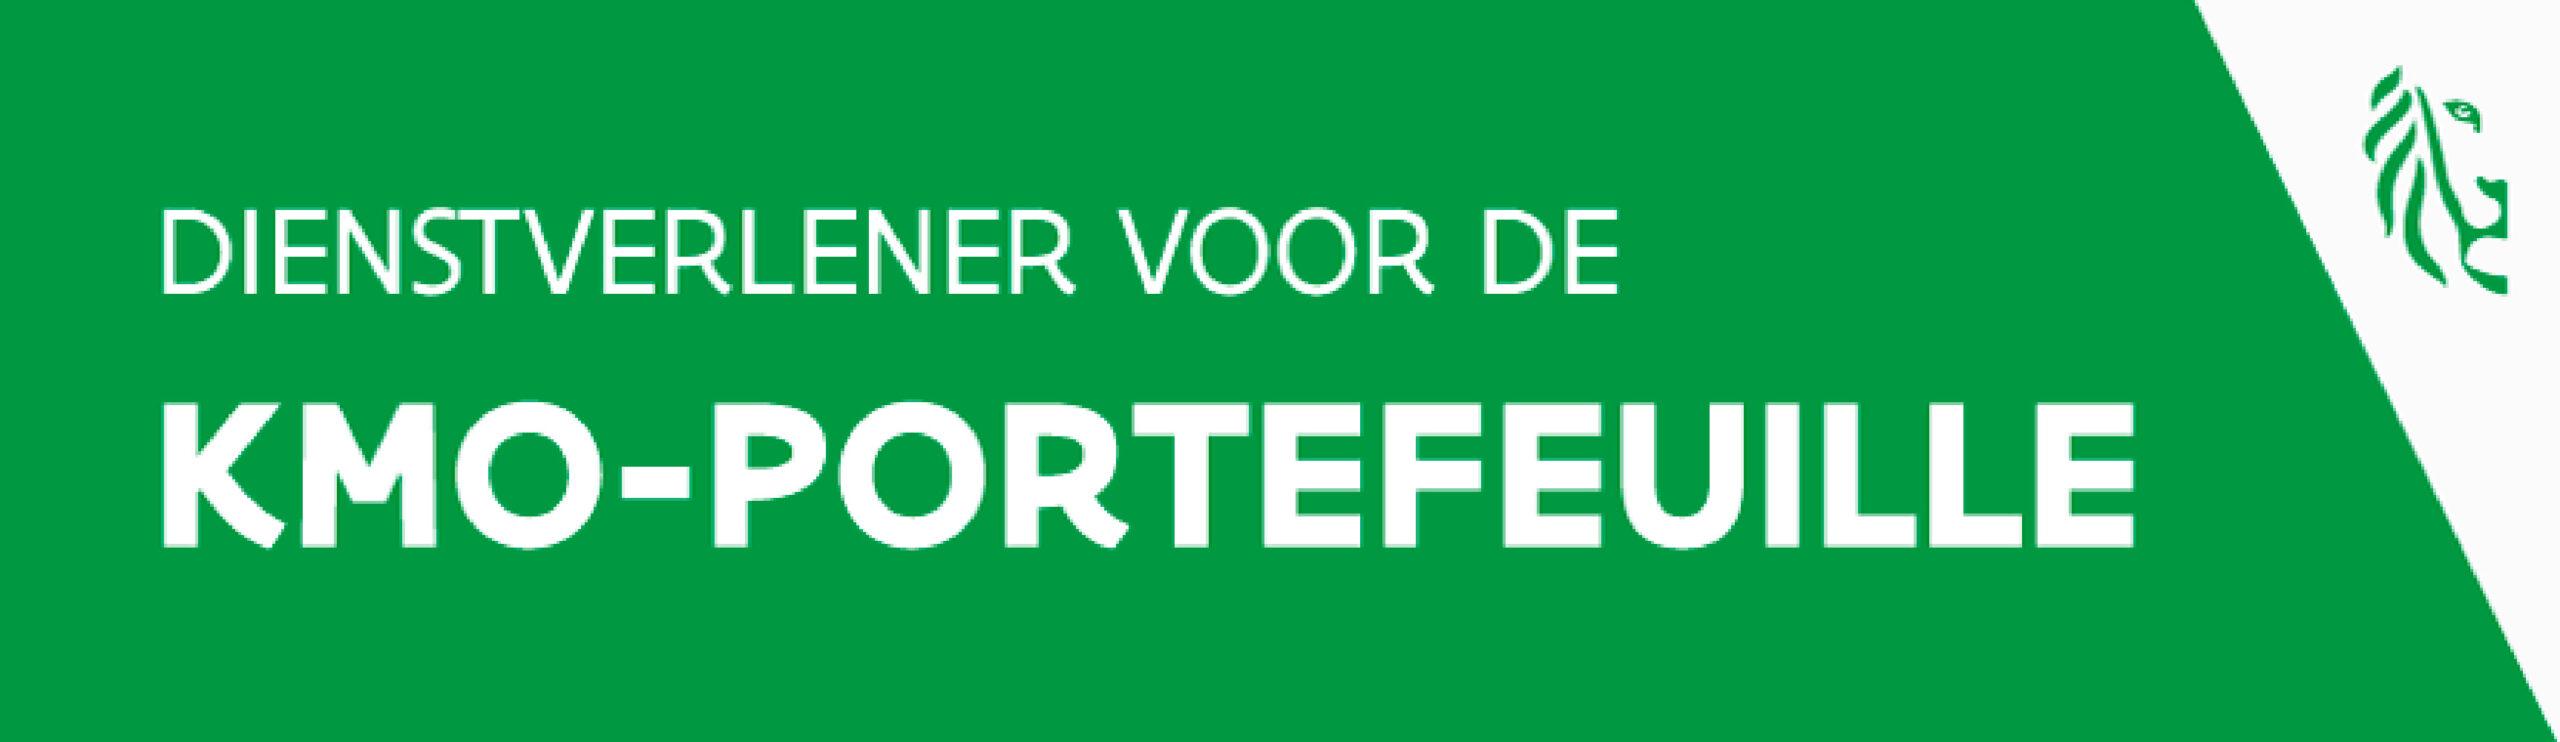 ewings xplore logo kmo portefuille